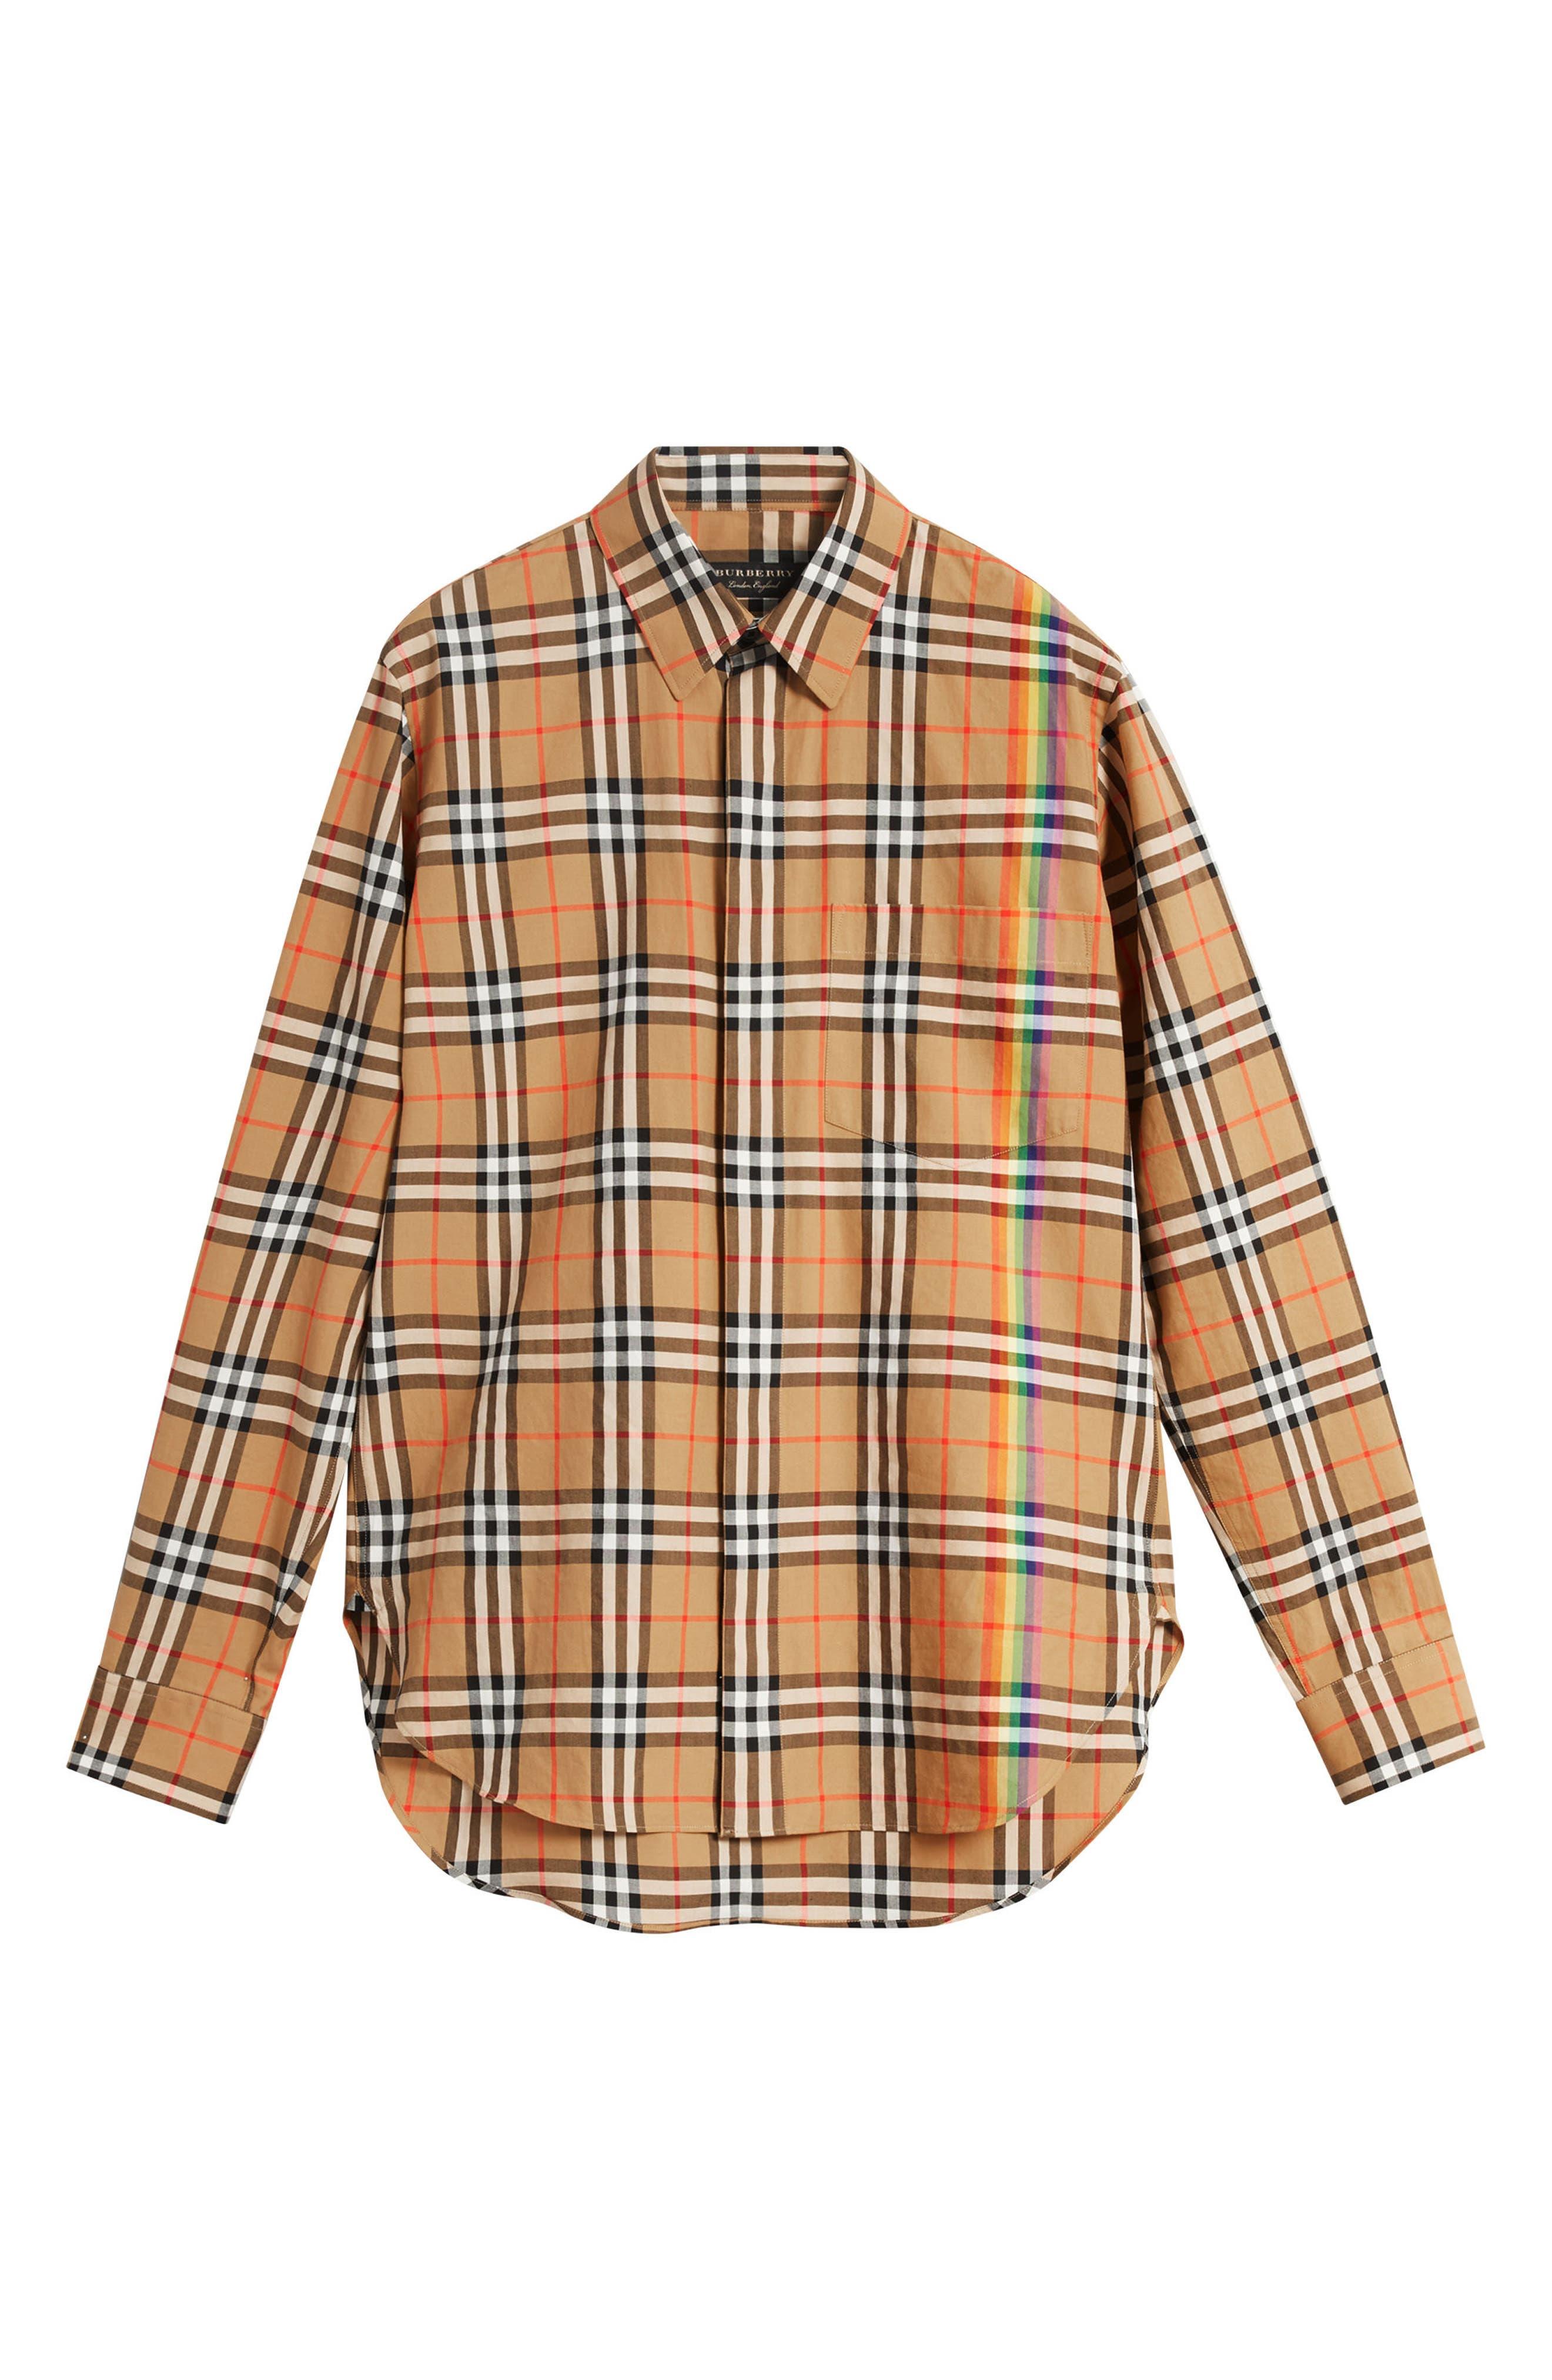 BURBERRY,                             Rainbow Check Shirt,                             Alternate thumbnail 5, color,                             254